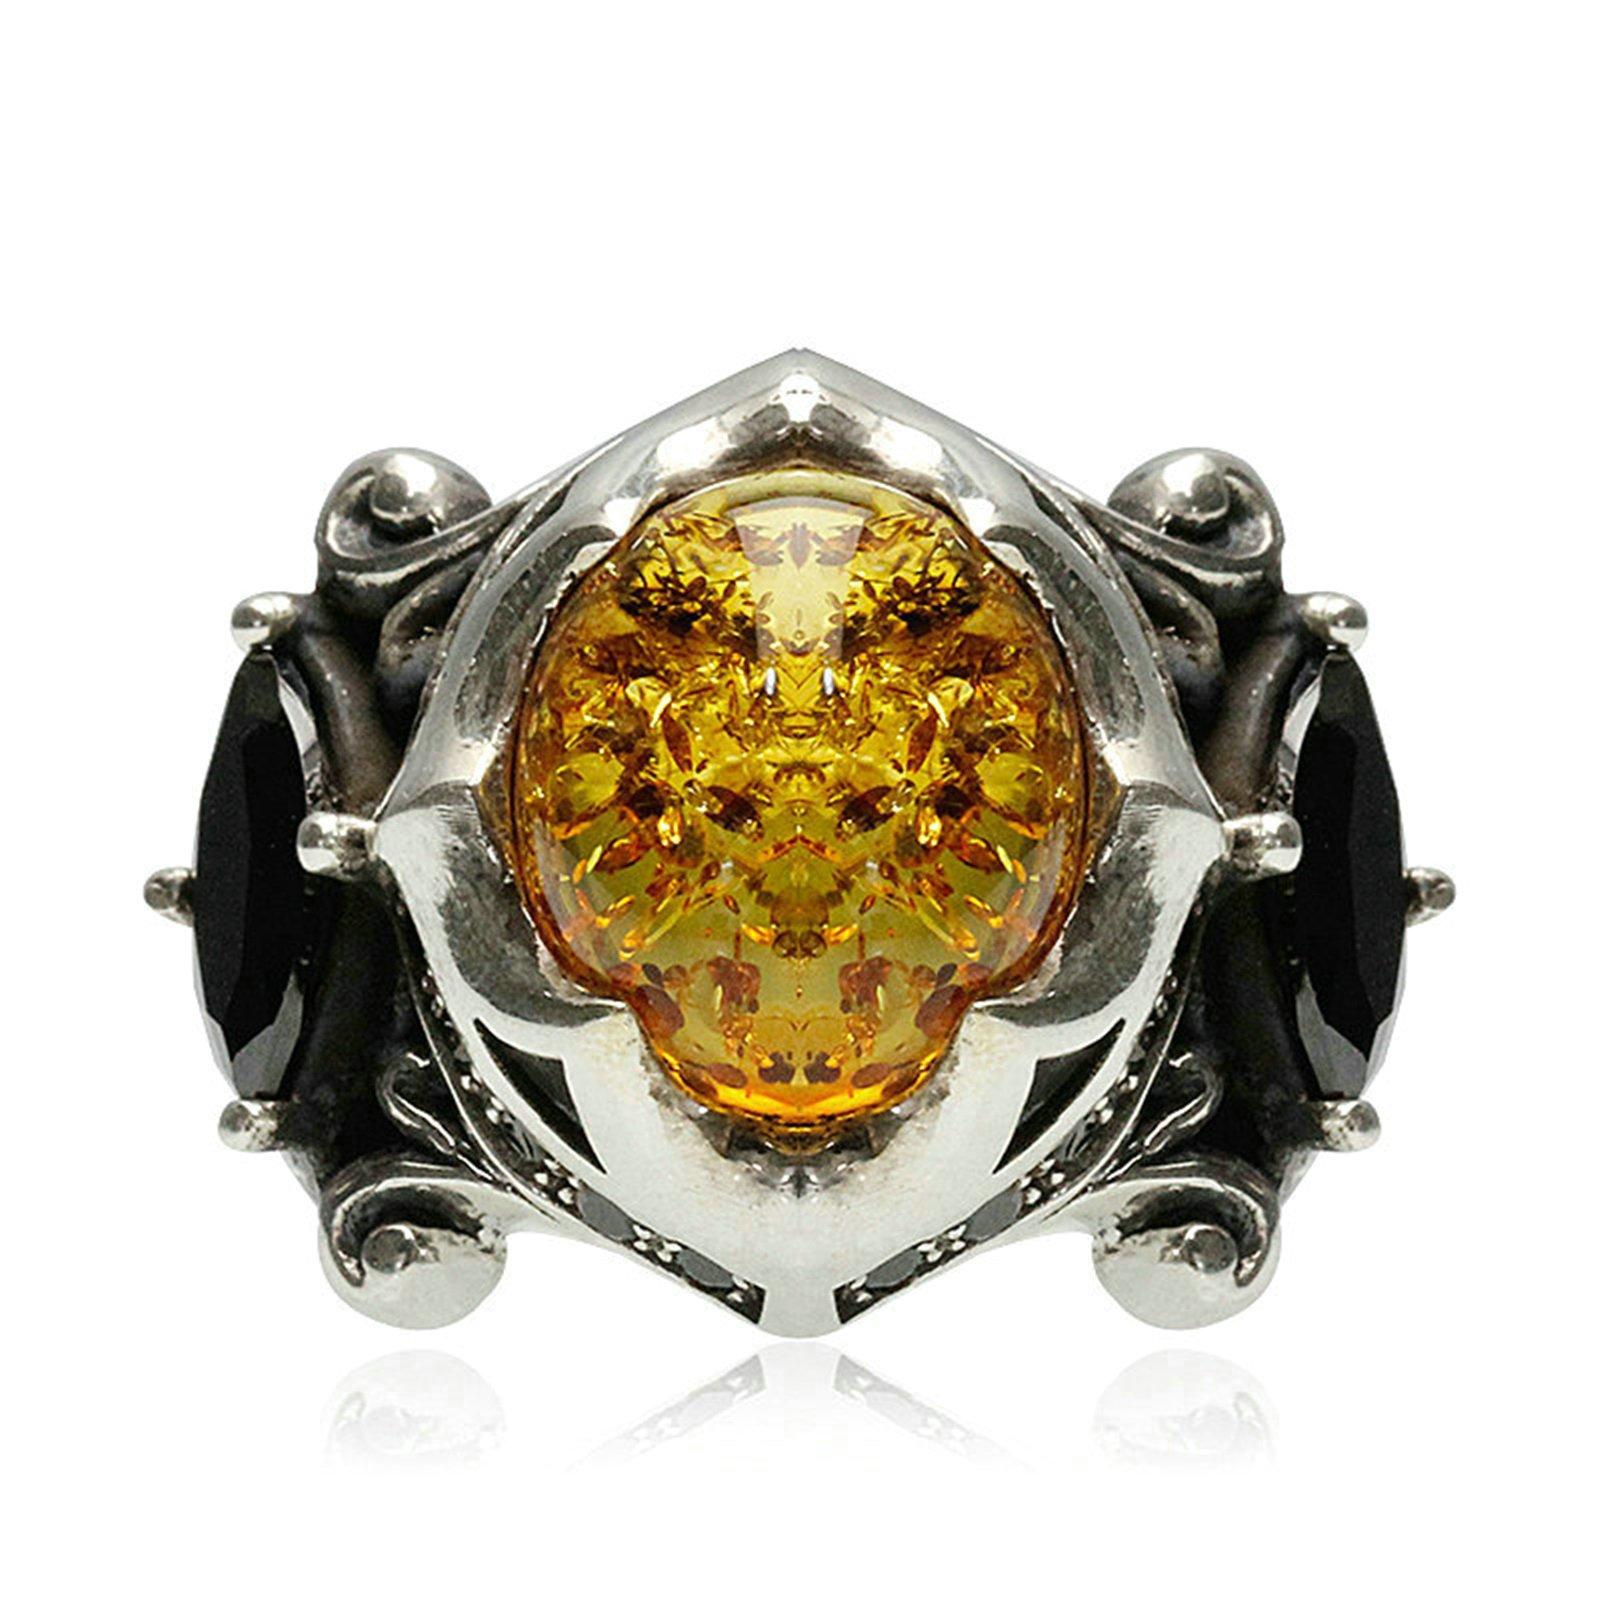 Adisaer Biker Rings Silver Ring for Men Black Cubic Zirconia Amber Ring Size 10 Vintage Punk Jewelry